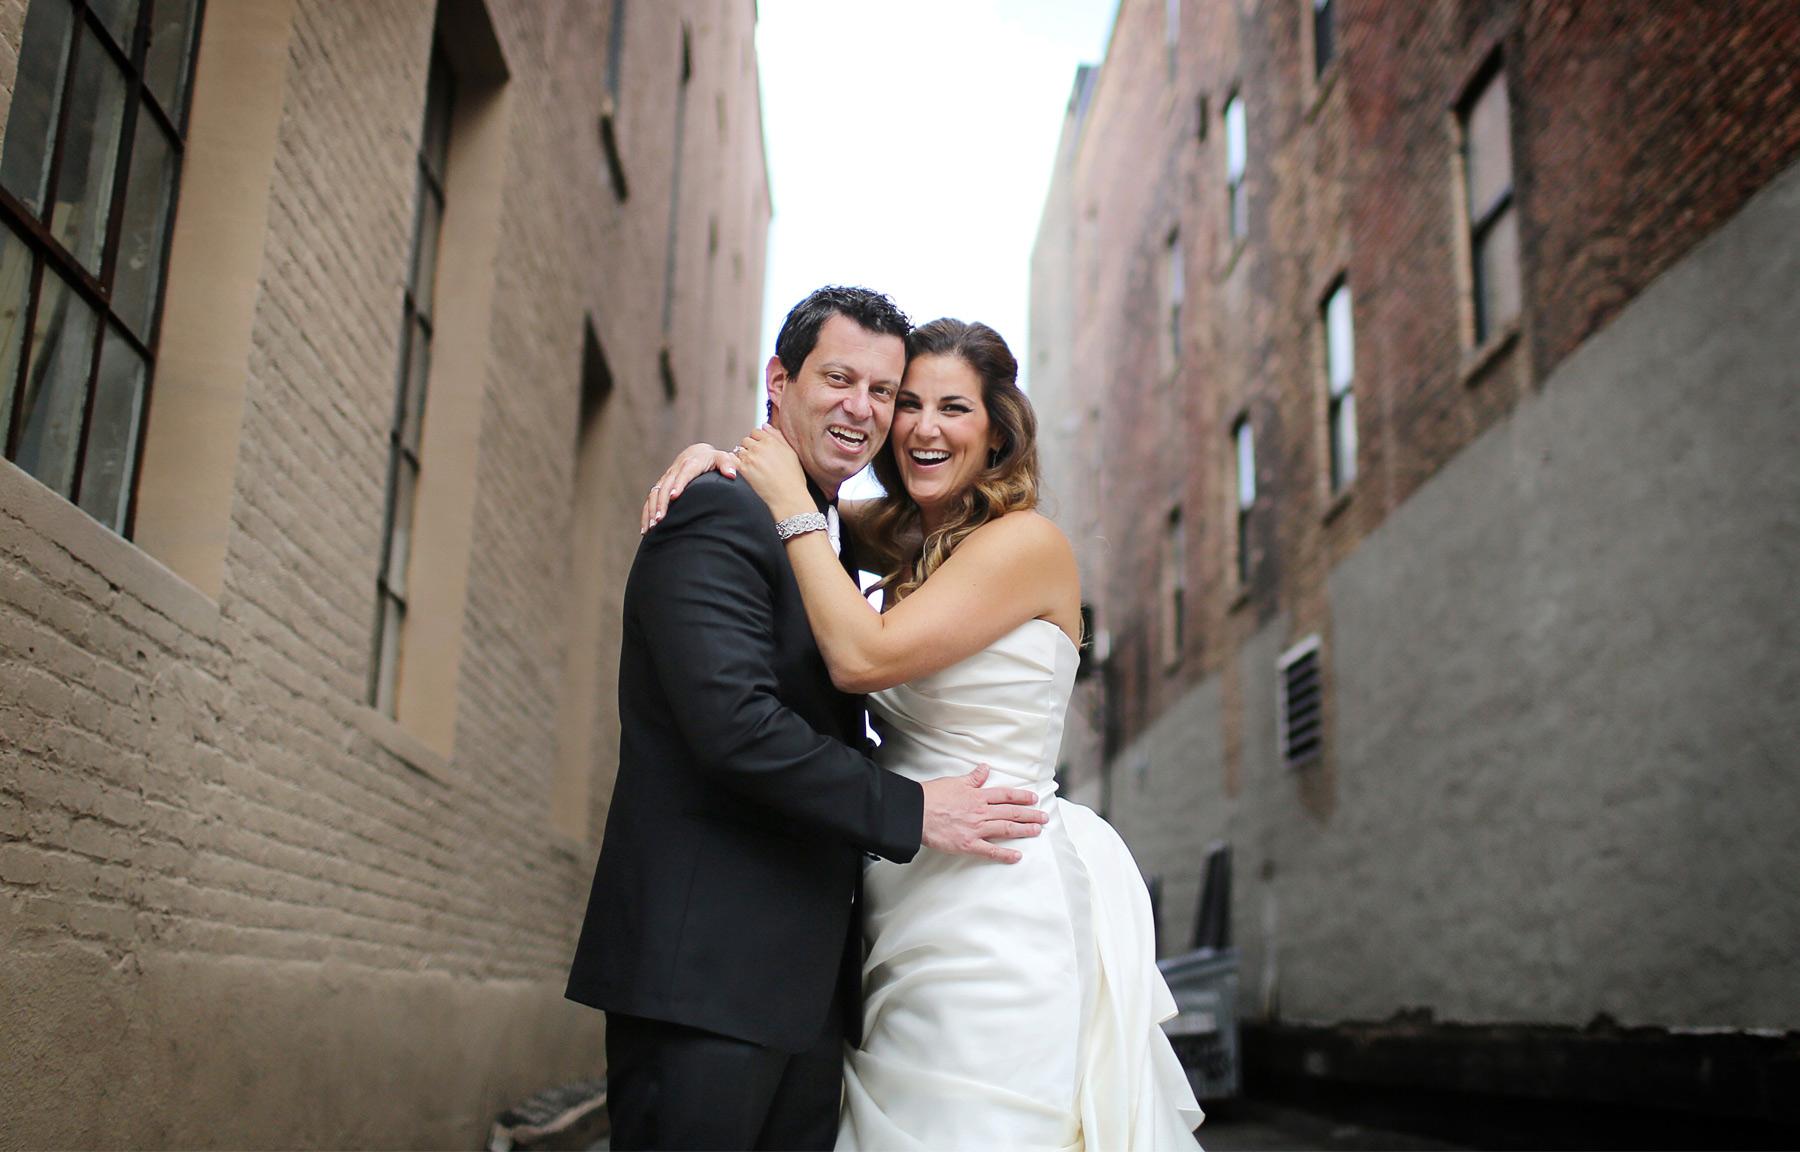 04-Minneapolis-Minnesota-Wedding-Photography-by-Vick-Photography-Aria-Downtown-First-Look-Layne-&-Dan.jpg